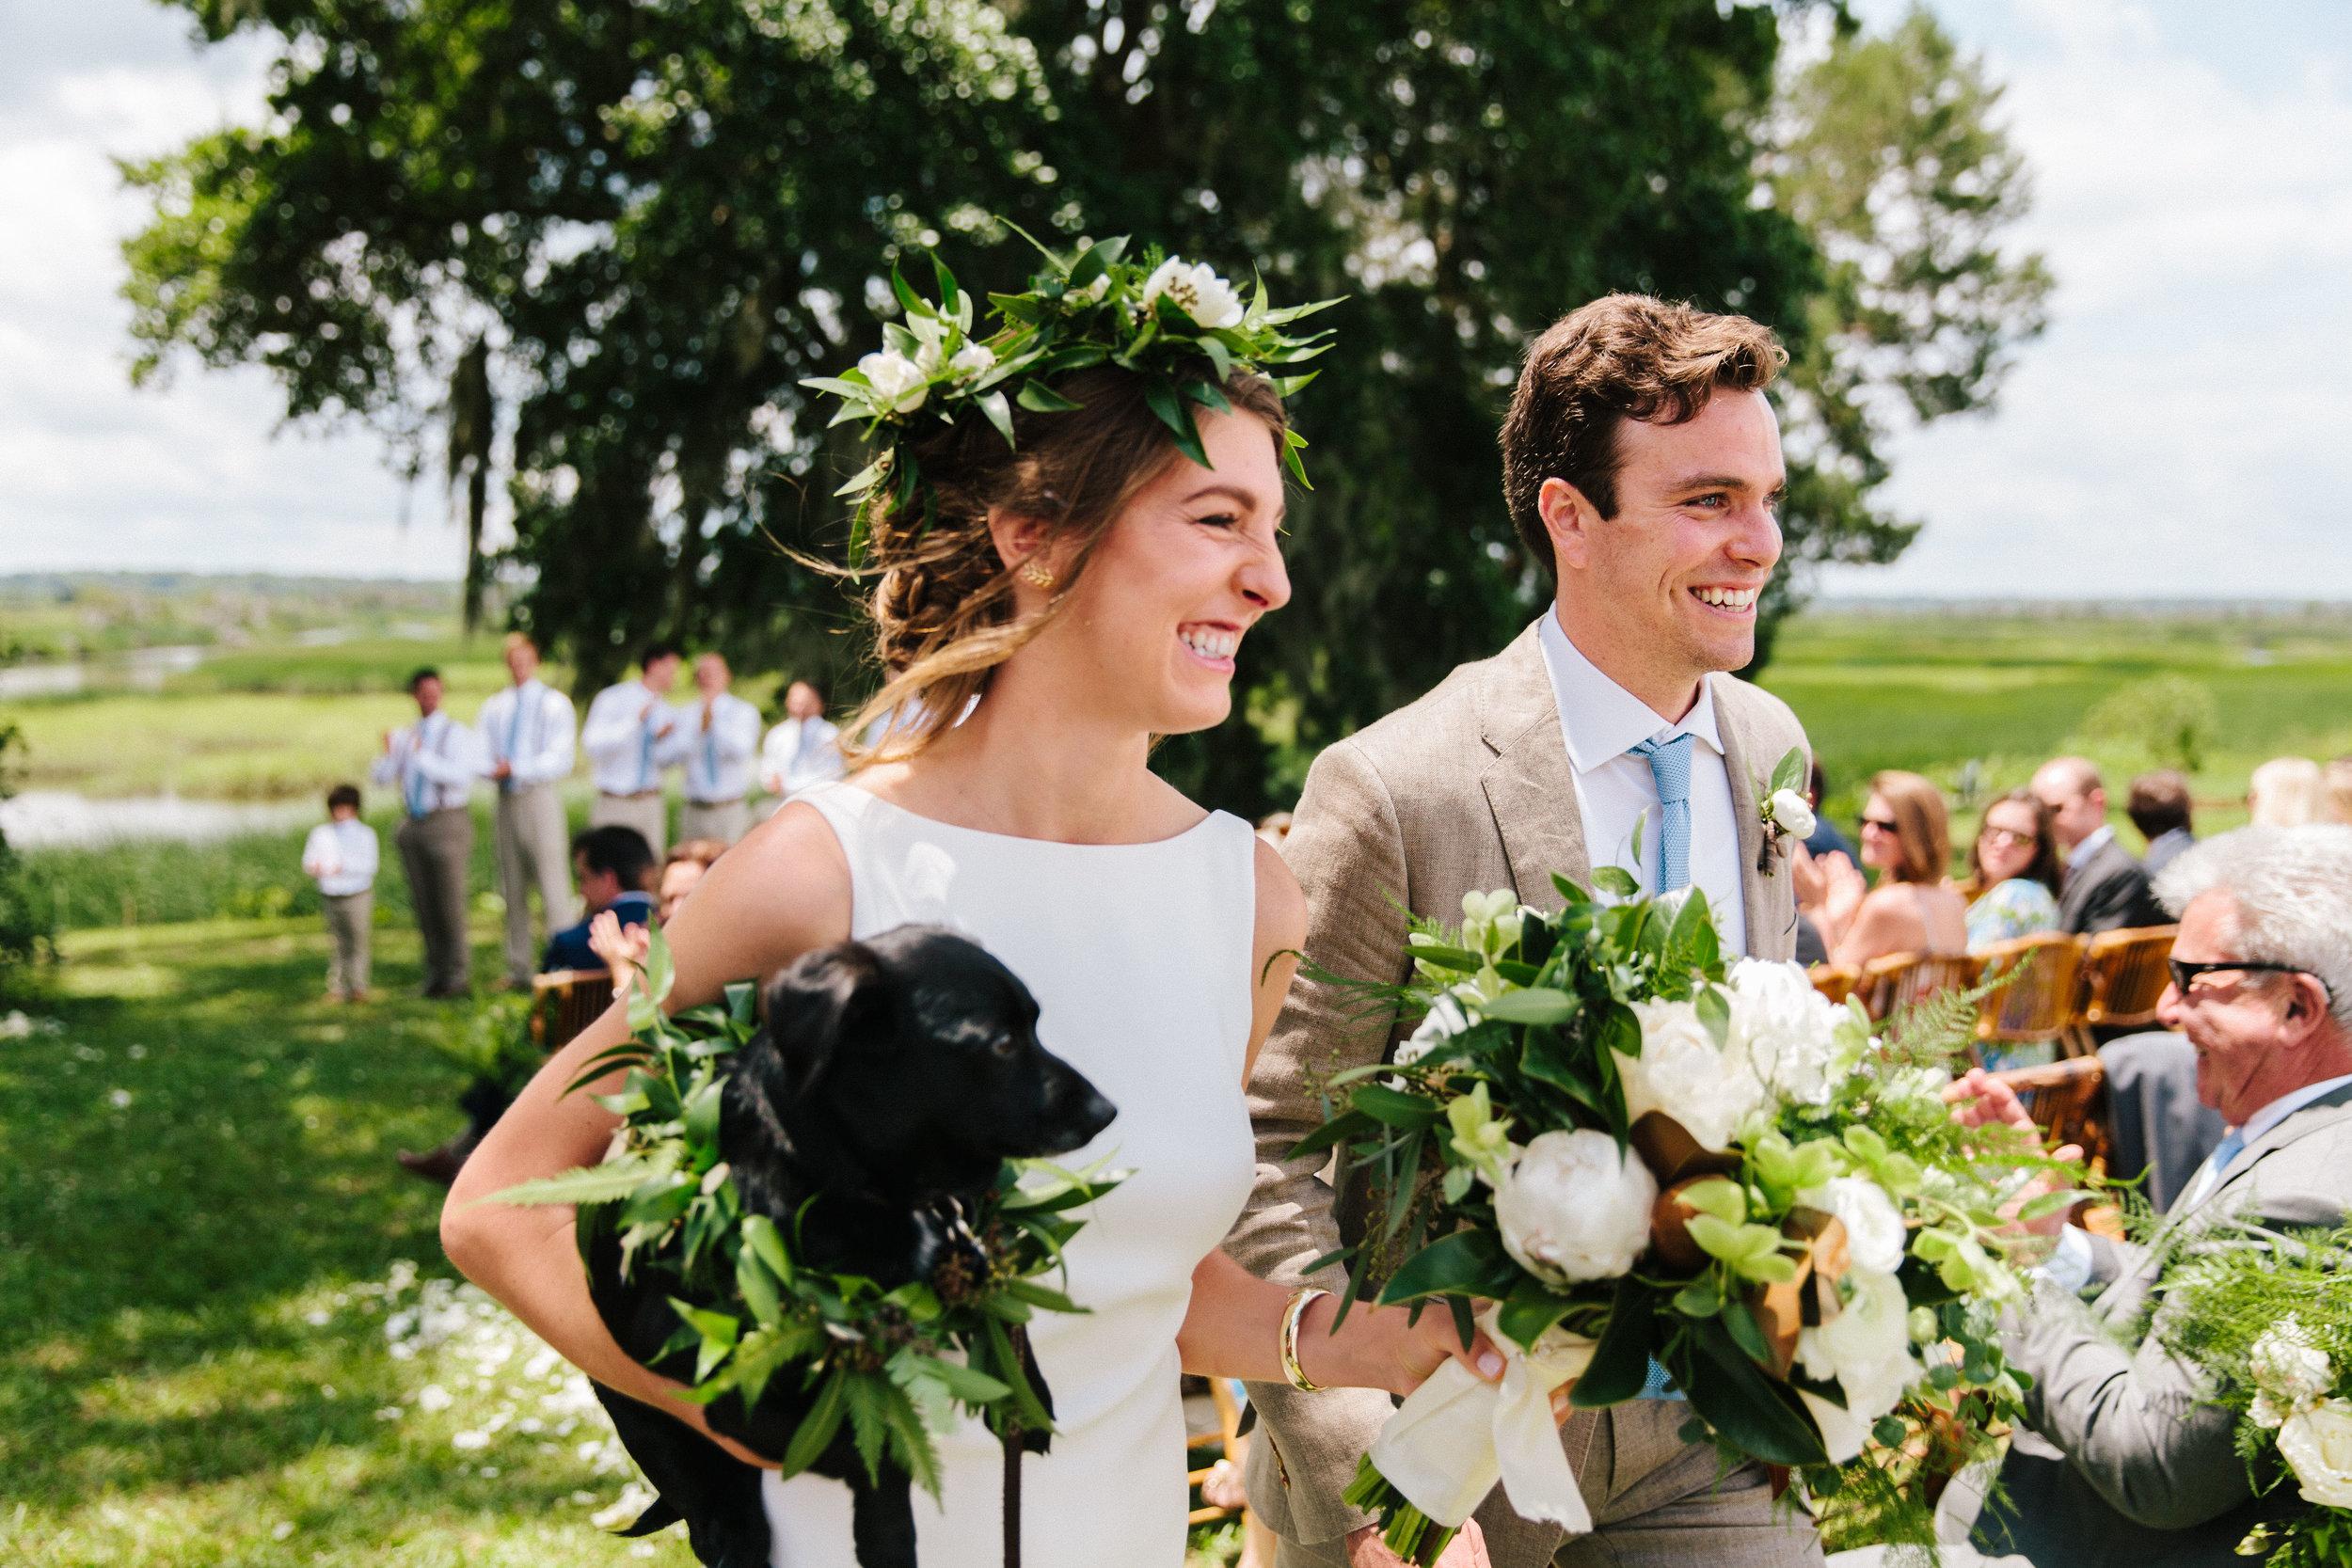 Tommy & Liz Summer wedding on Plum Hill (a.k.a. The Forrest Gump Plantation) - Yemassee, SC